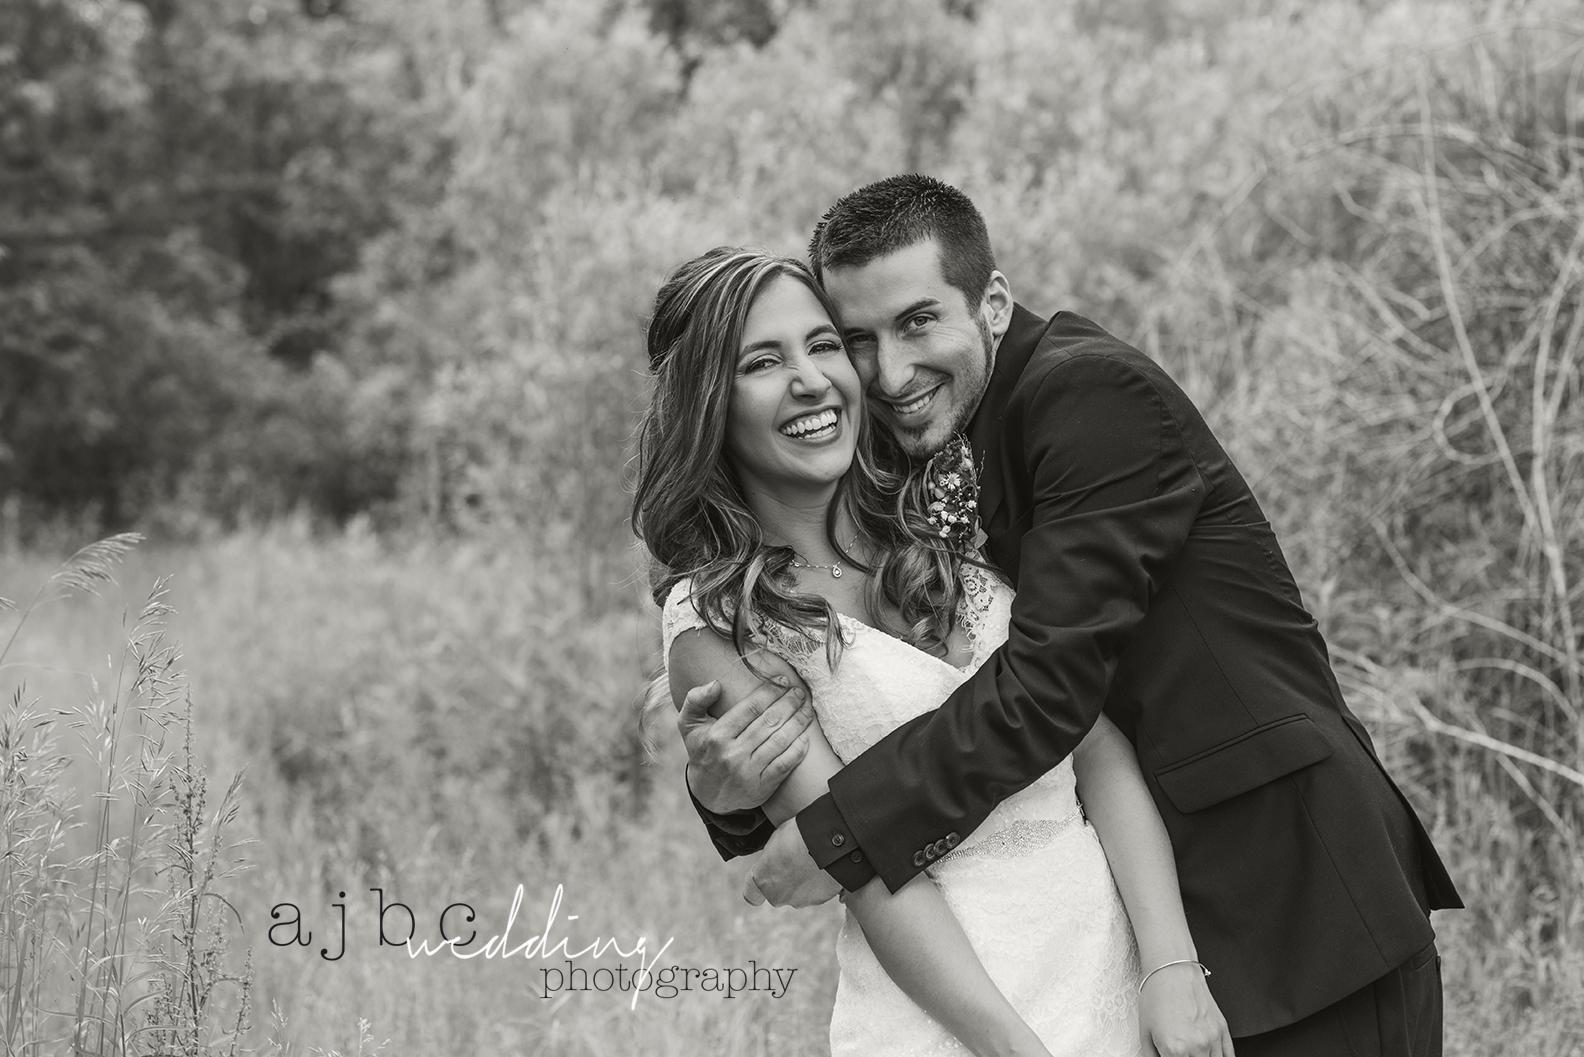 ajbcphotography-port-huron-michigan-wedding-photographer-outdoors-summer-wedding-country-wedding-wadhams-michigan-bride-vintage-wedding-groom-love.jpg